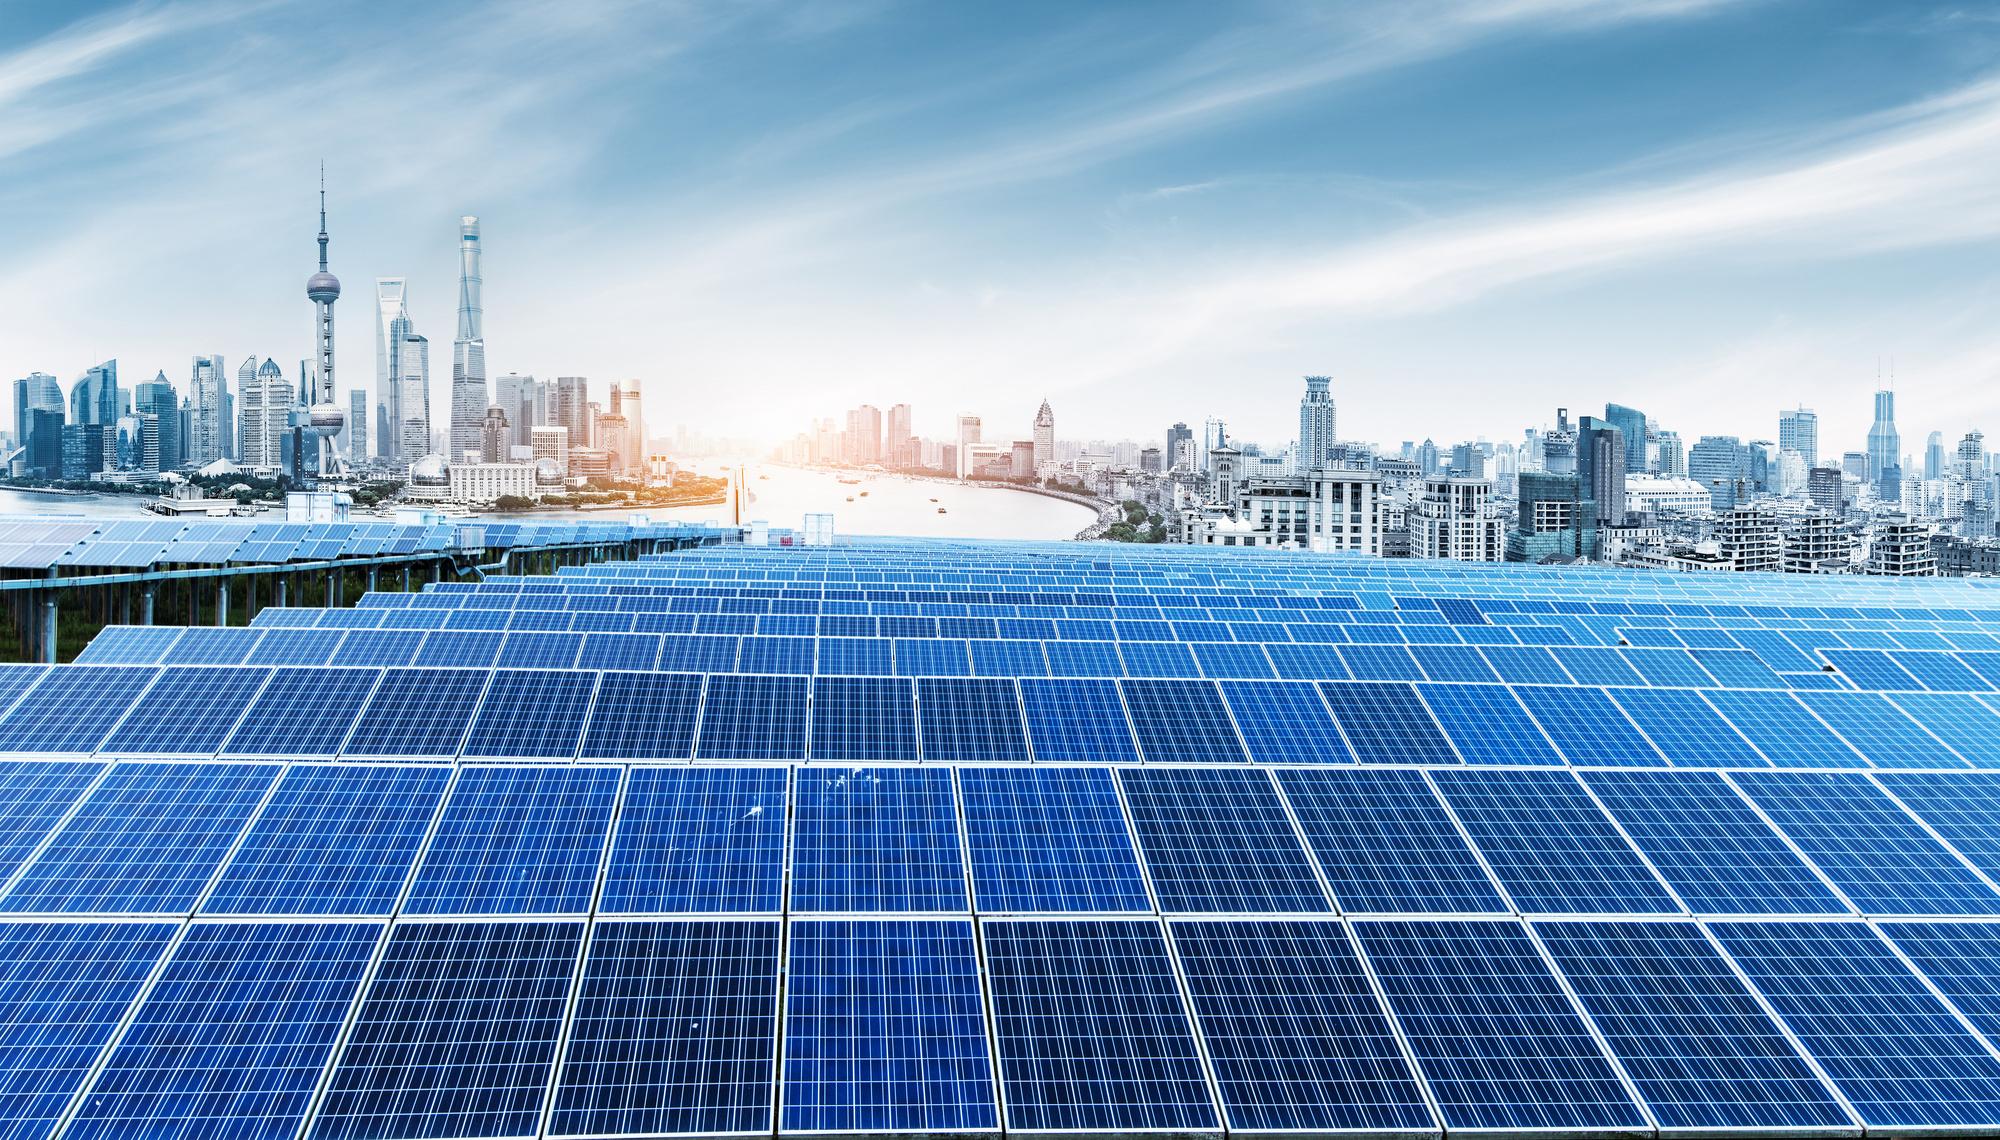 New York State 2020 Solar Tax Credit